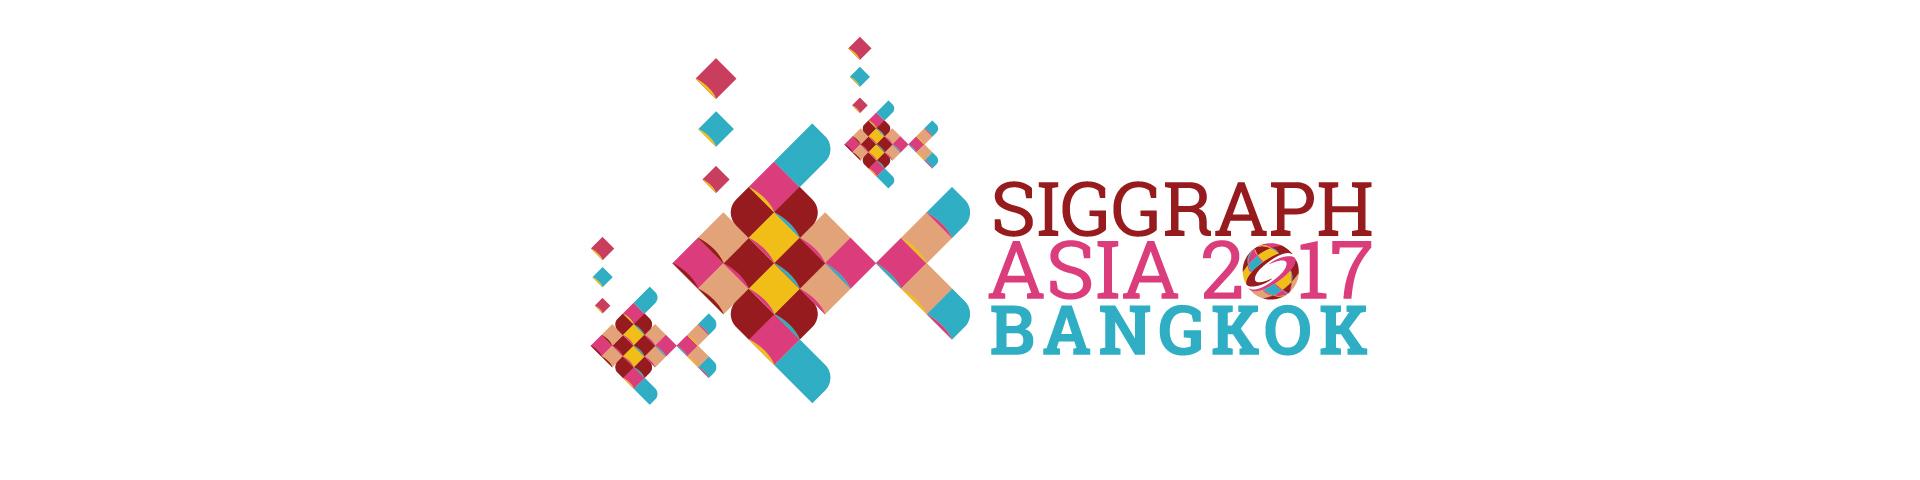 SIGGRAPH Asia 2017 Logo